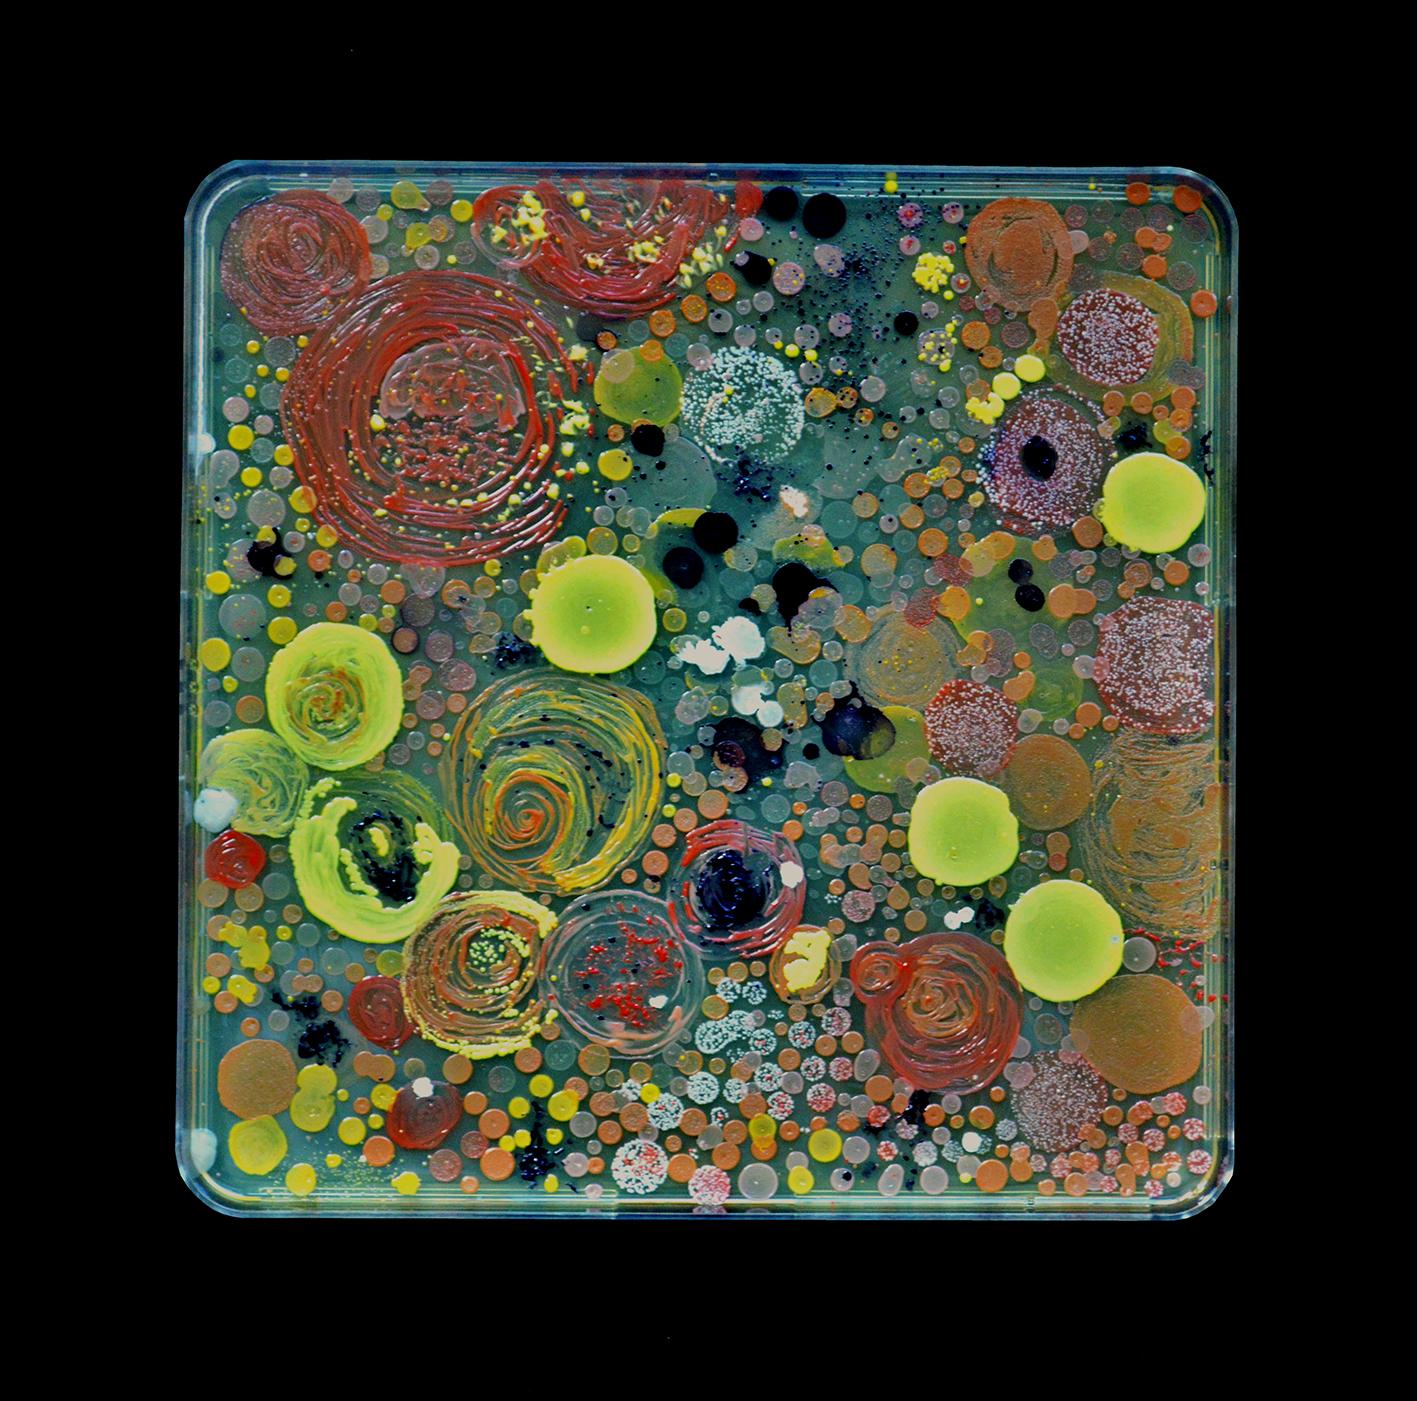 Penil Cobo,  Interactions , Microbes in agar